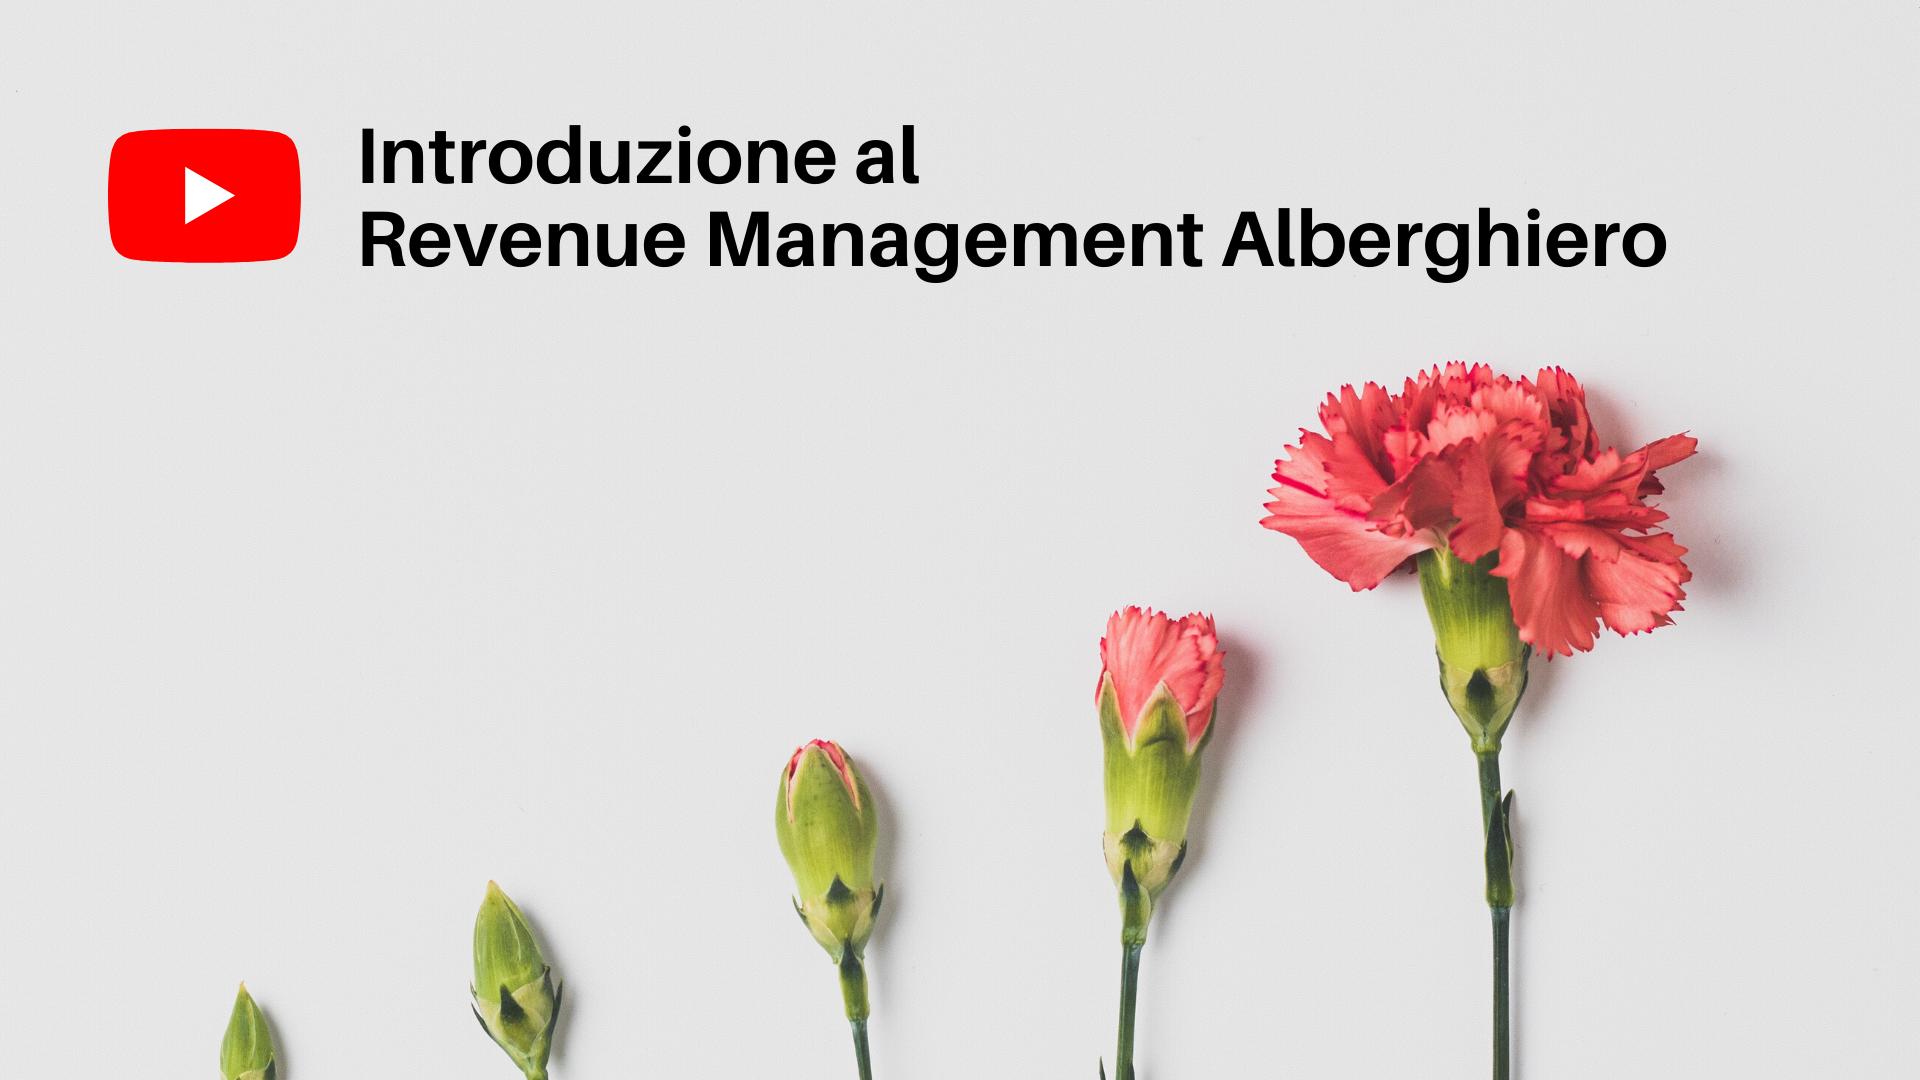 trilogia di video per avvicinarsi ai temi di revenue management per strutture ricettive